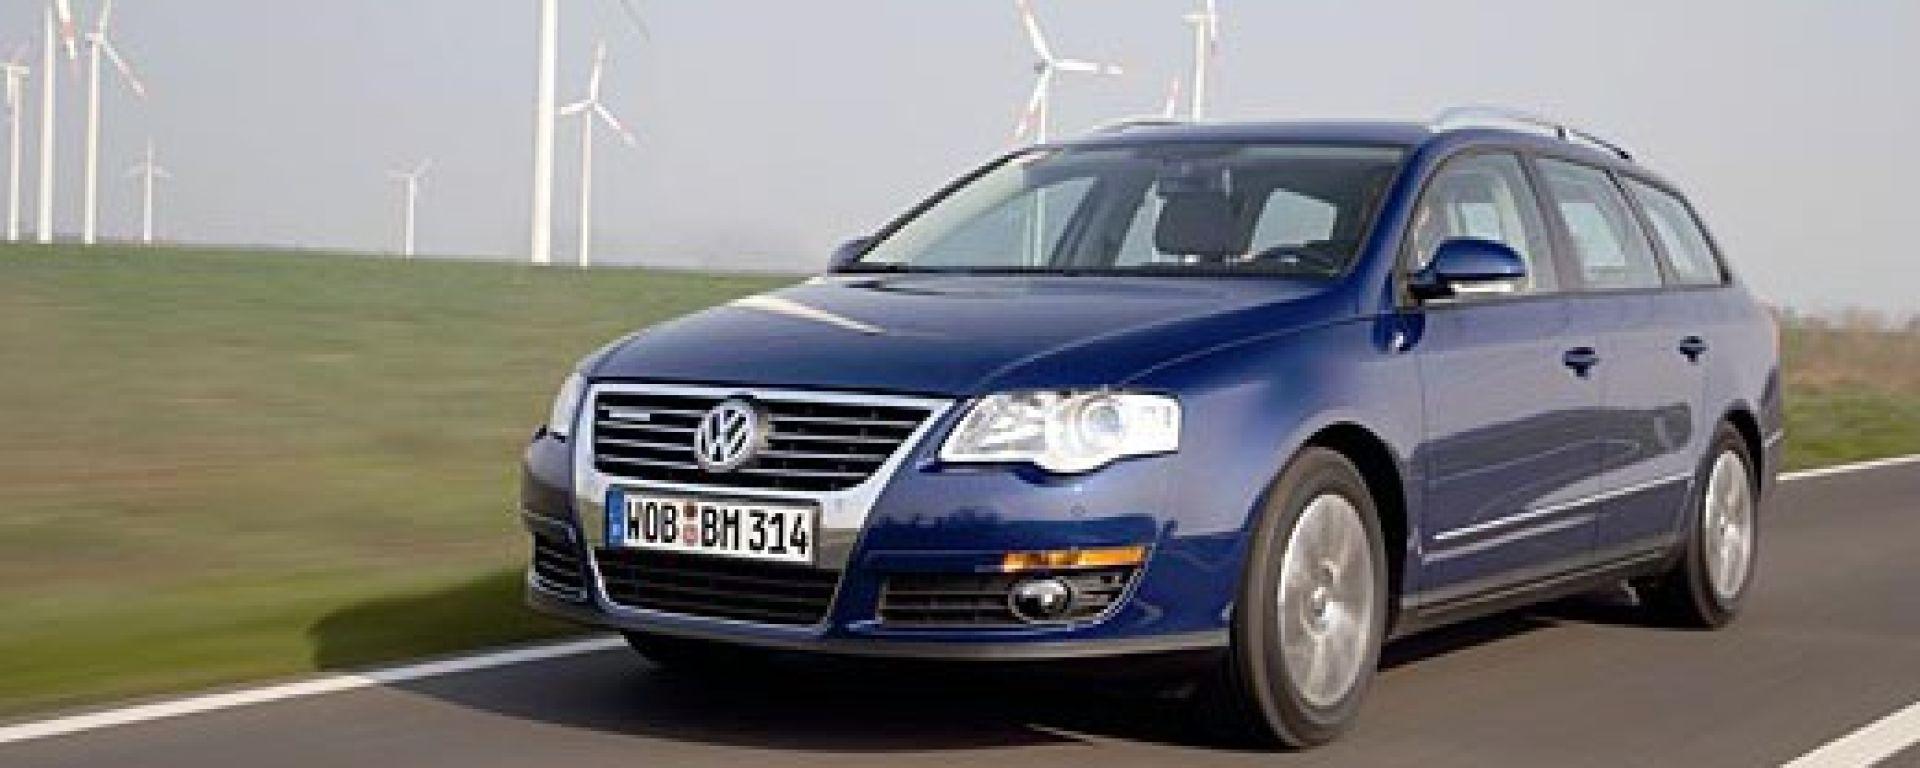 Volkswagen Passat Variant 2.0 TDI BlueMotion